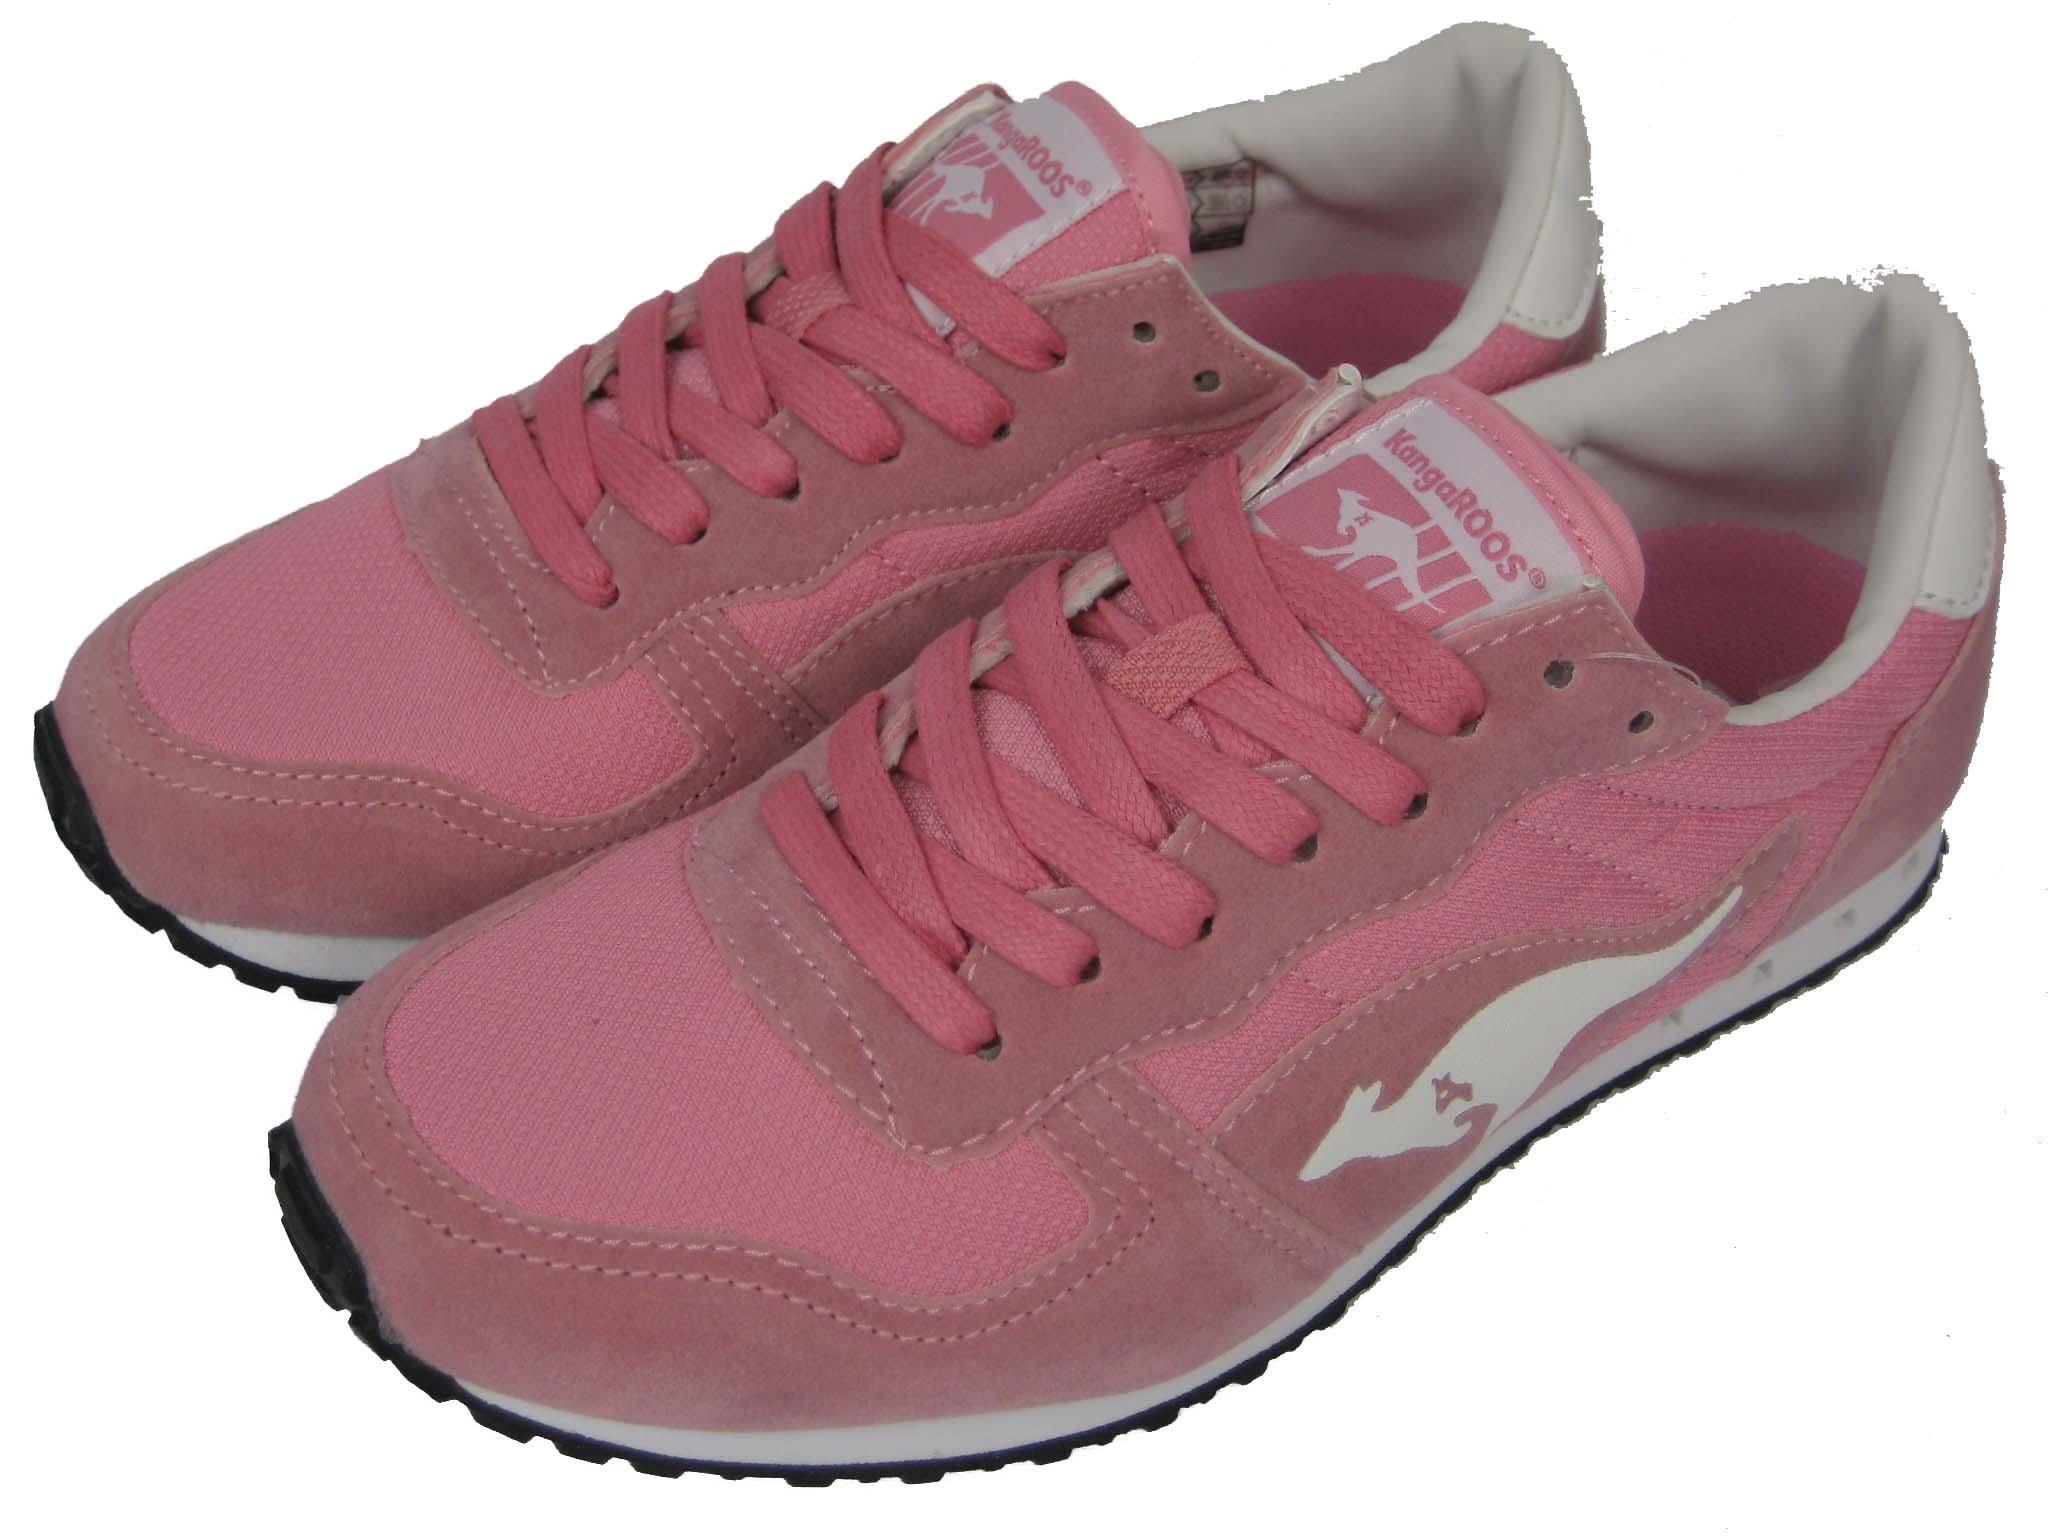 ea70b08bb4 Iii Schuh Damen Pink Rosa Kangaroos Blaze White Sneaker Laufschuh XqUx5U